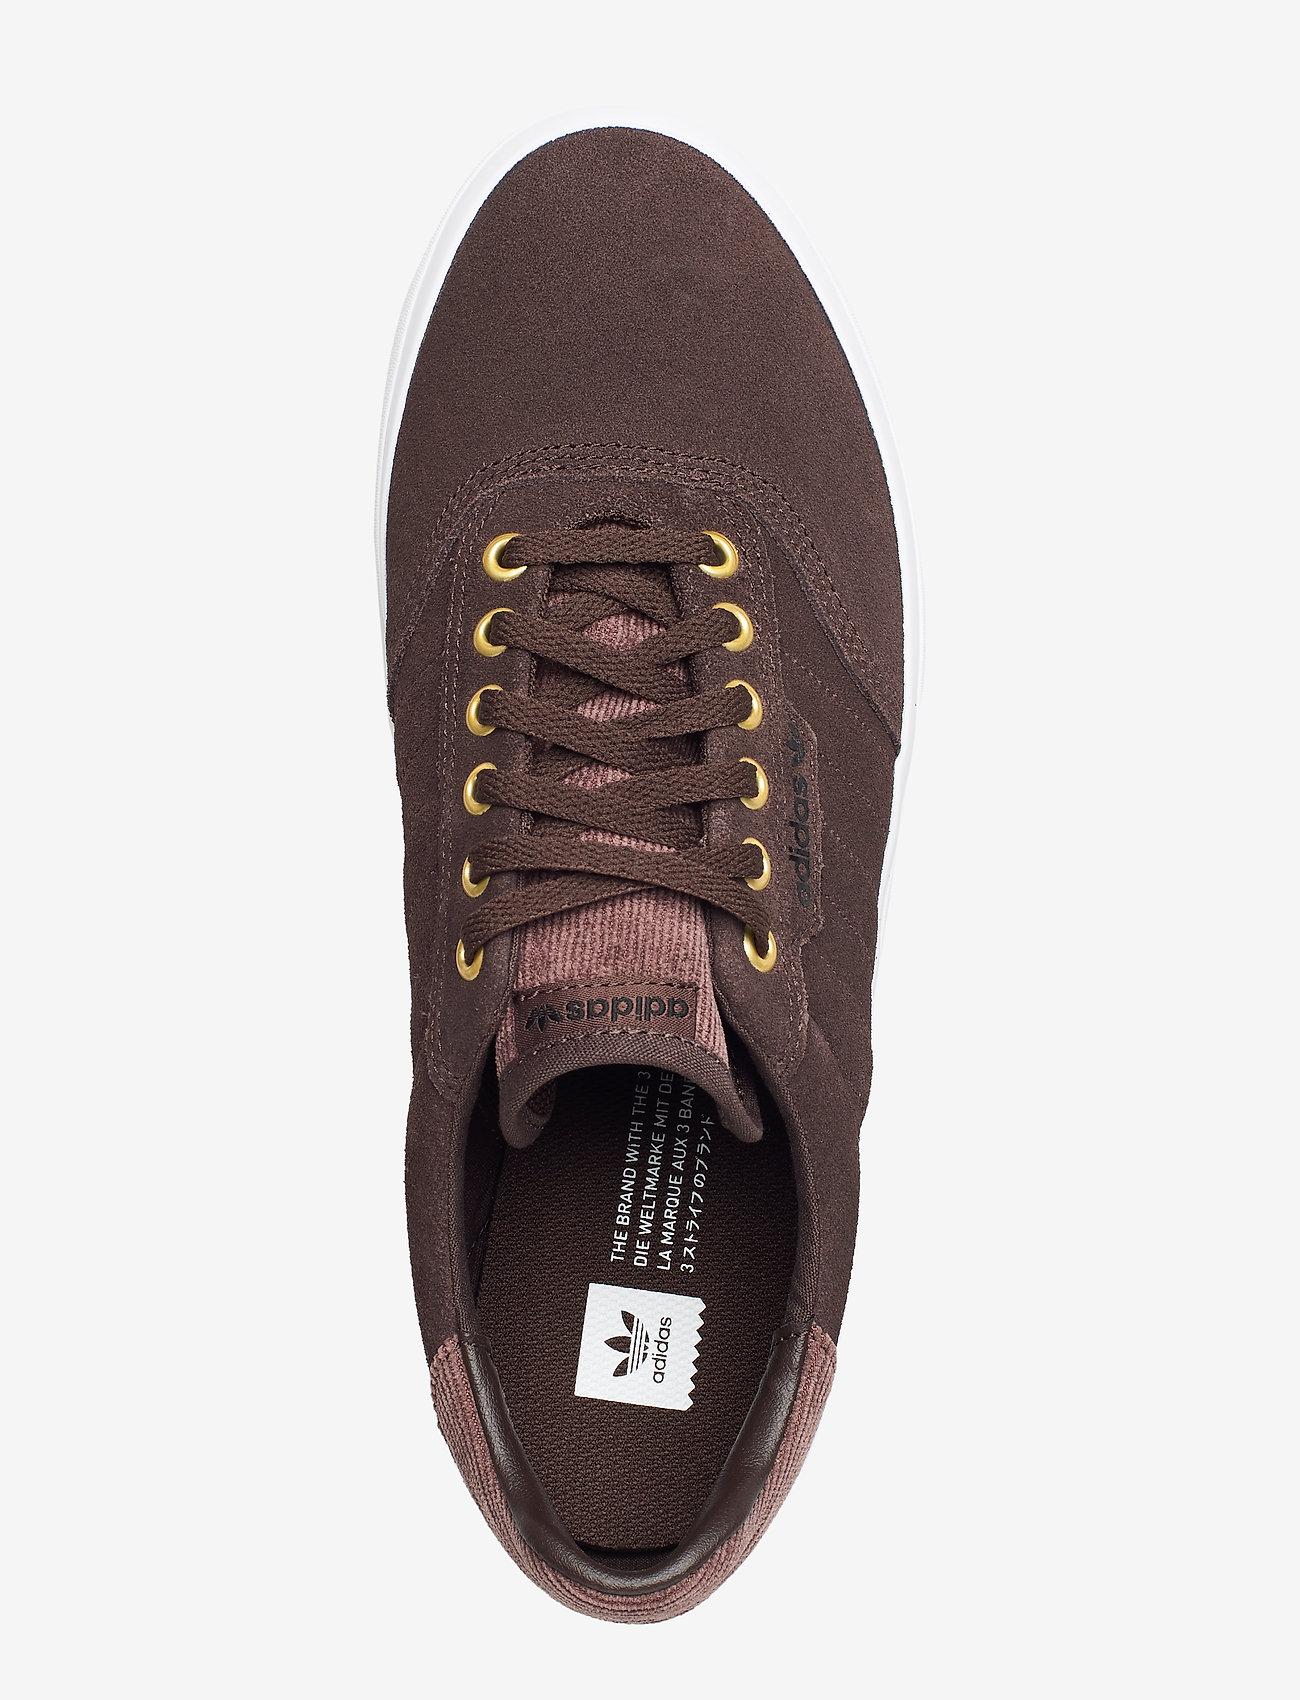 3mc (Brown/ftwwht/goldmt) (32.48 €) - adidas Performance 6nFWo